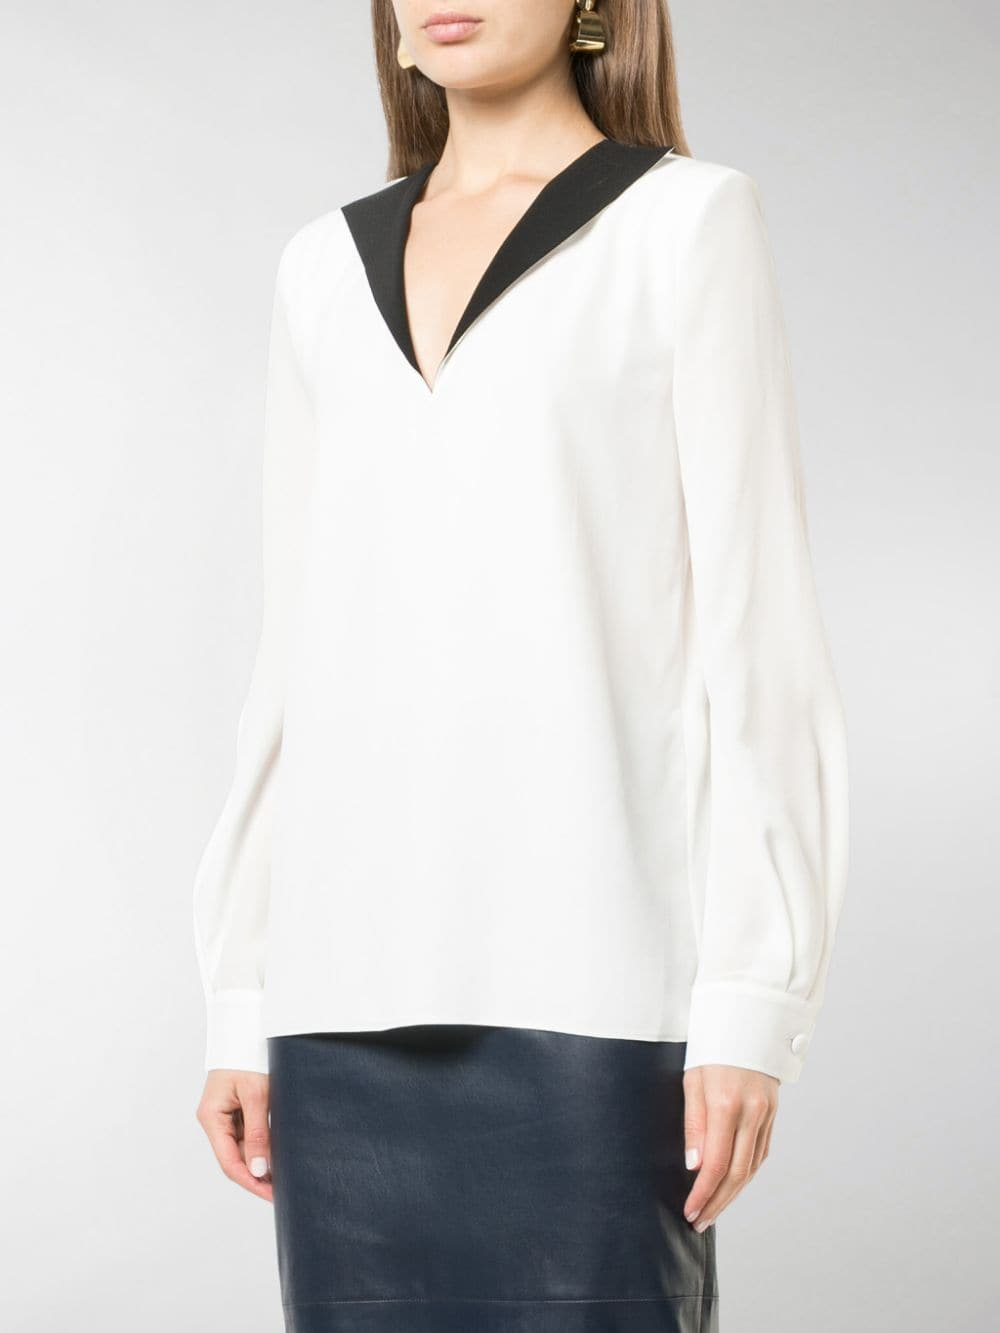 white silk blouse with contrasting black V neck detail GIVENCHY |  | BW60ER10JX116